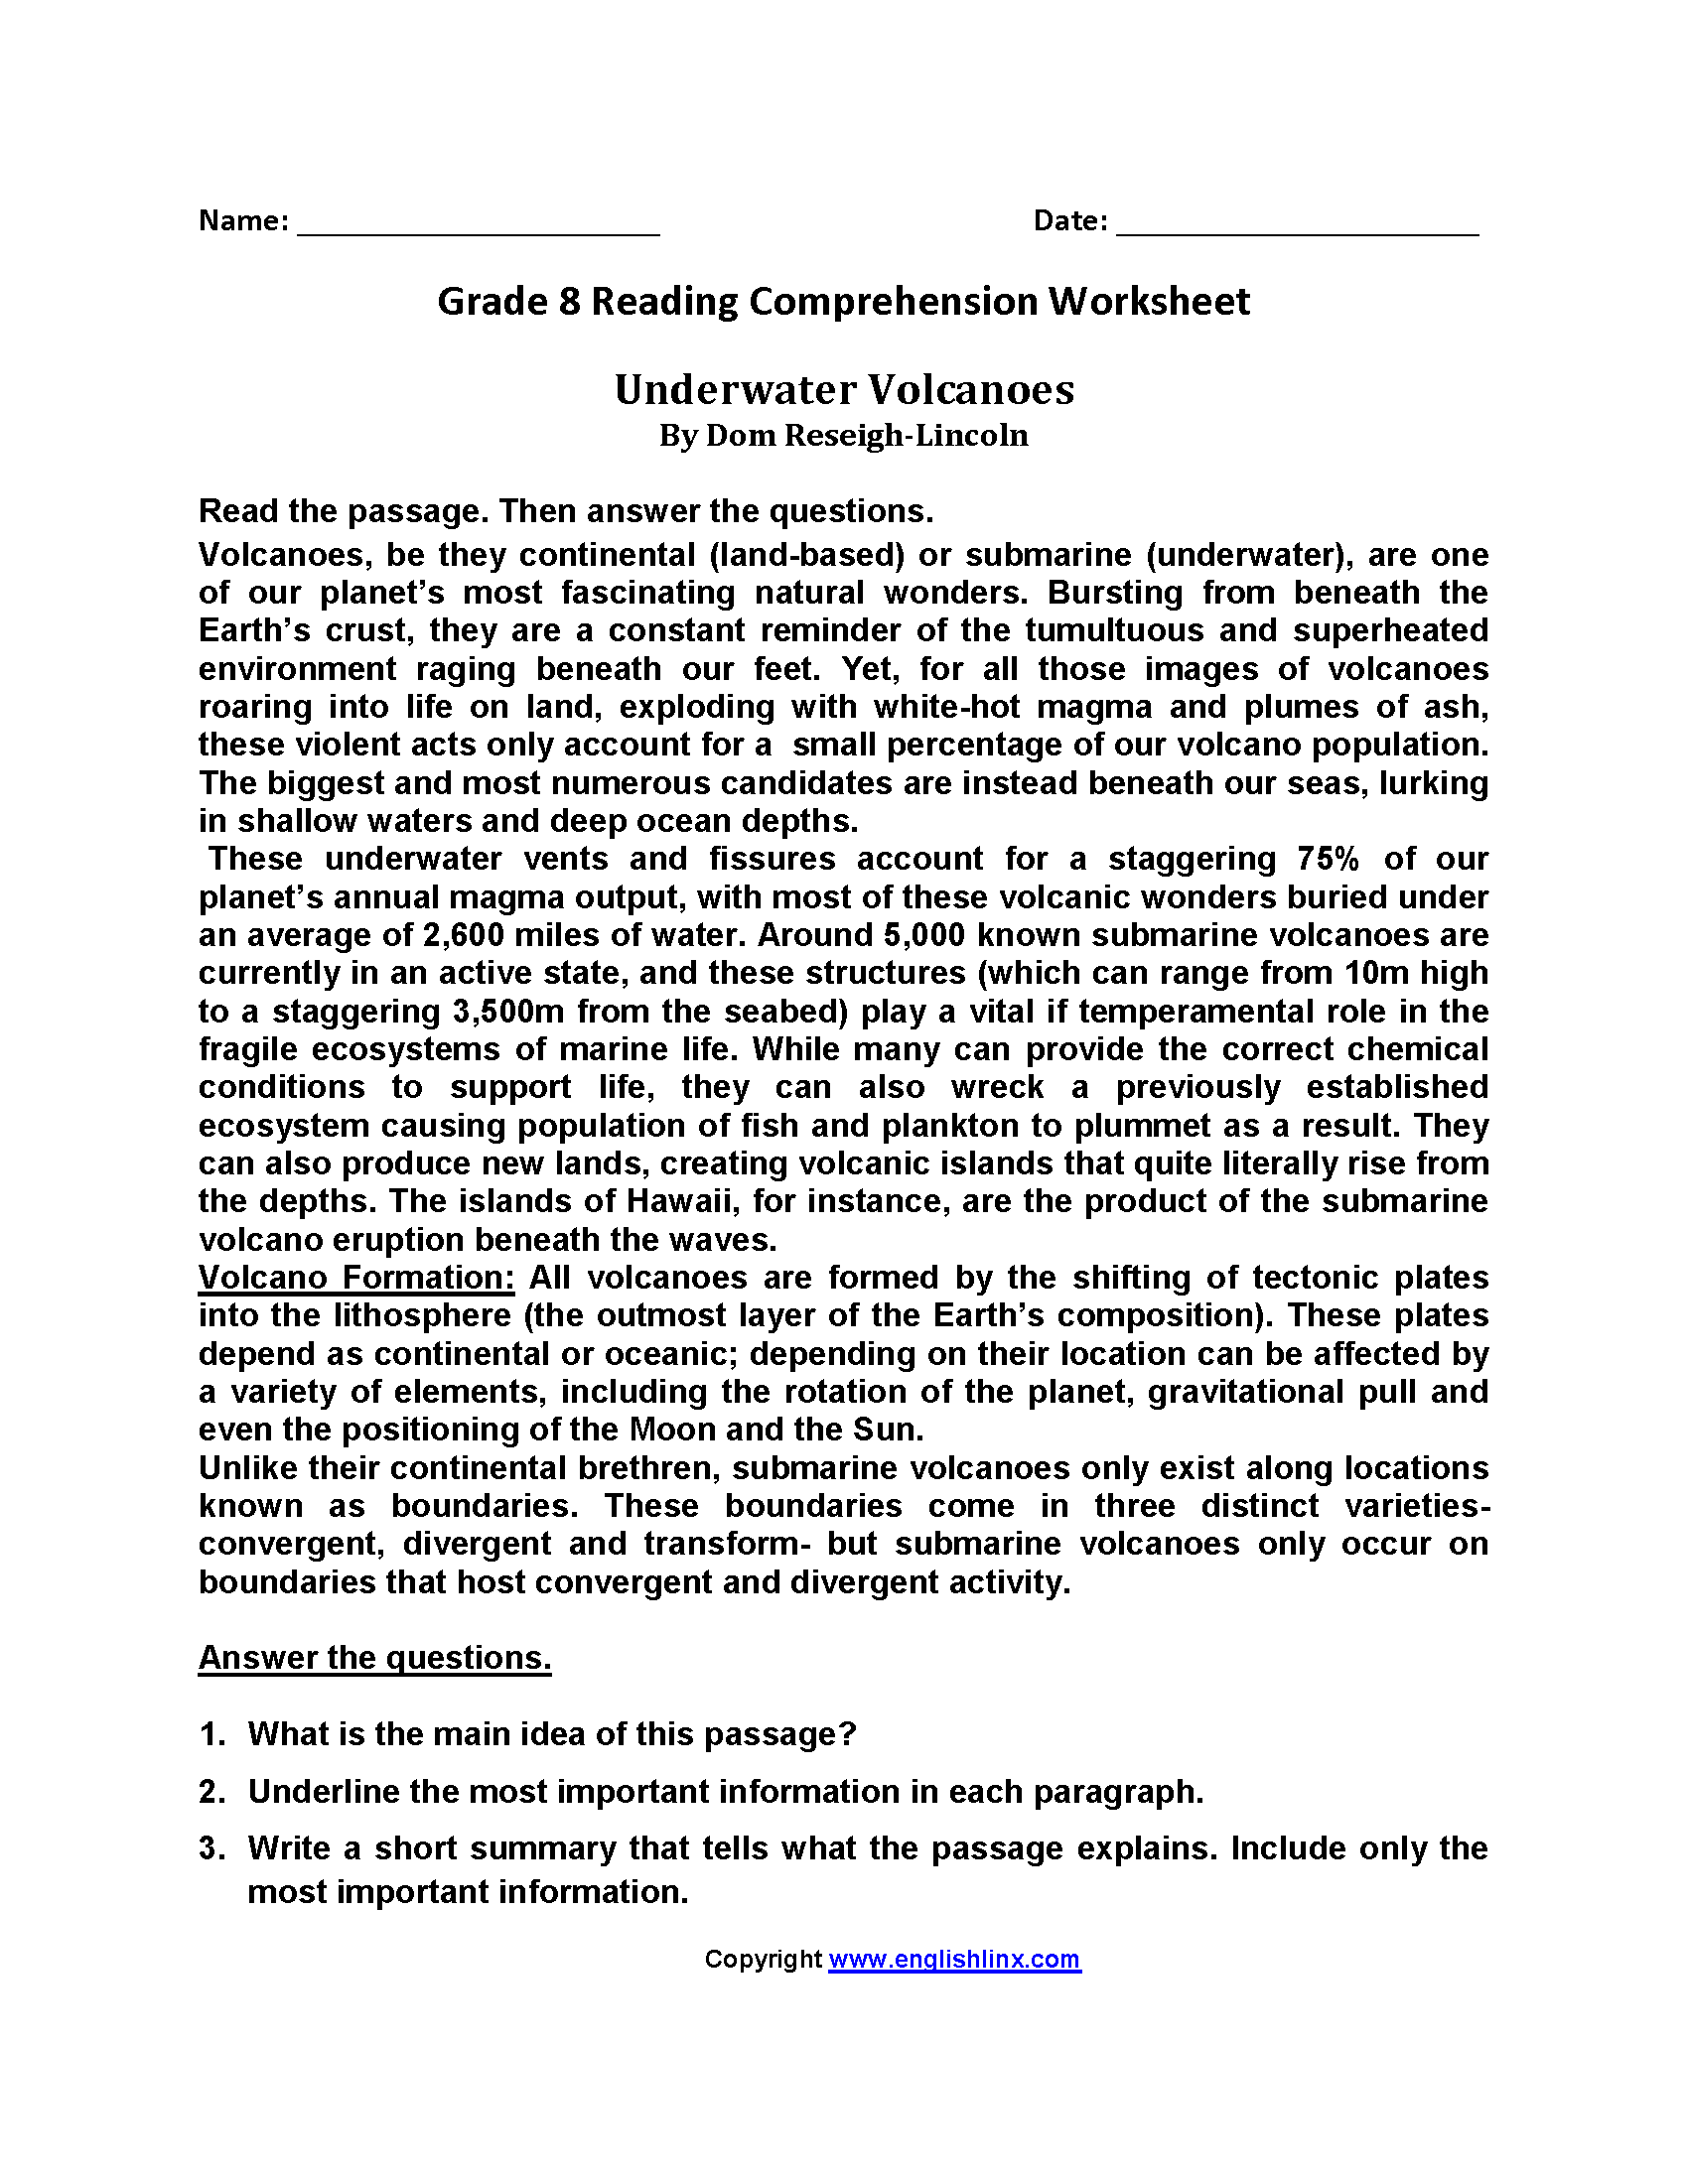 Worksheets Eighth Grade English Worksheets eighth grade reading worksheets englishlinx com board worksheets